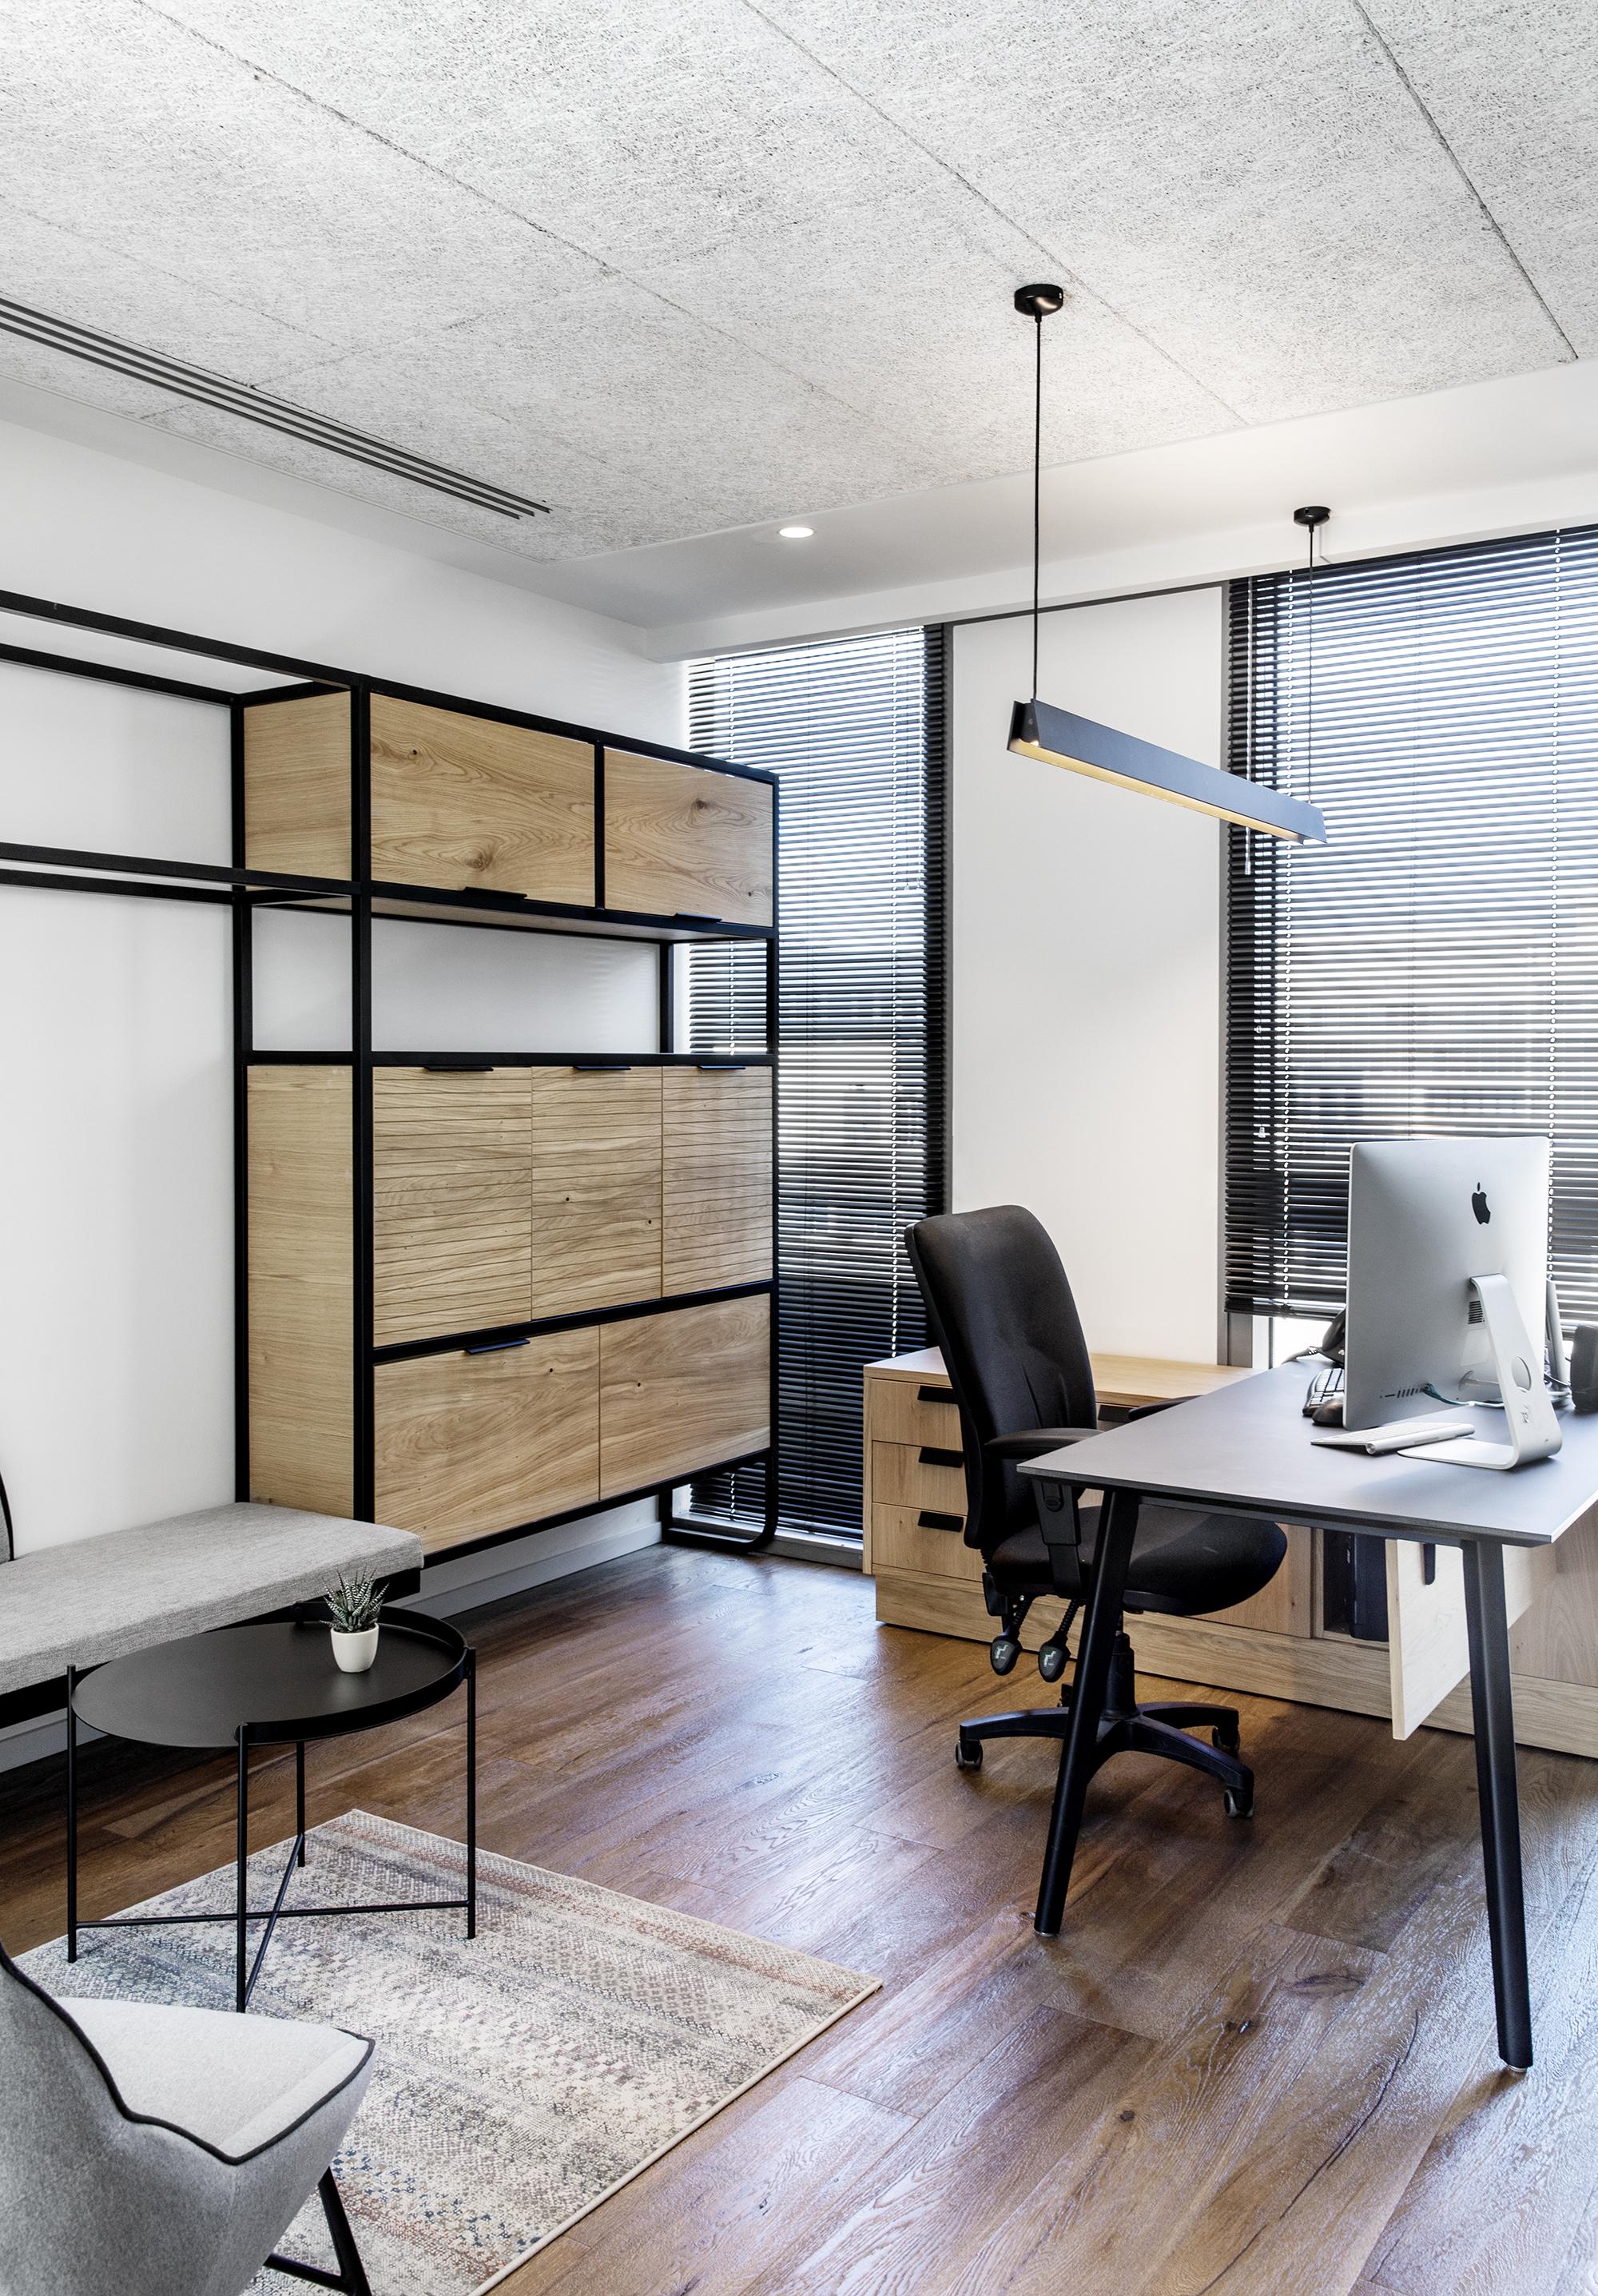 R2NET OFFICES - ROY DAVID ARCHITECTURE  STUDIO - רואי דוד אדריכלות סטודיו אדריכלים - אר2נט (5).jpg